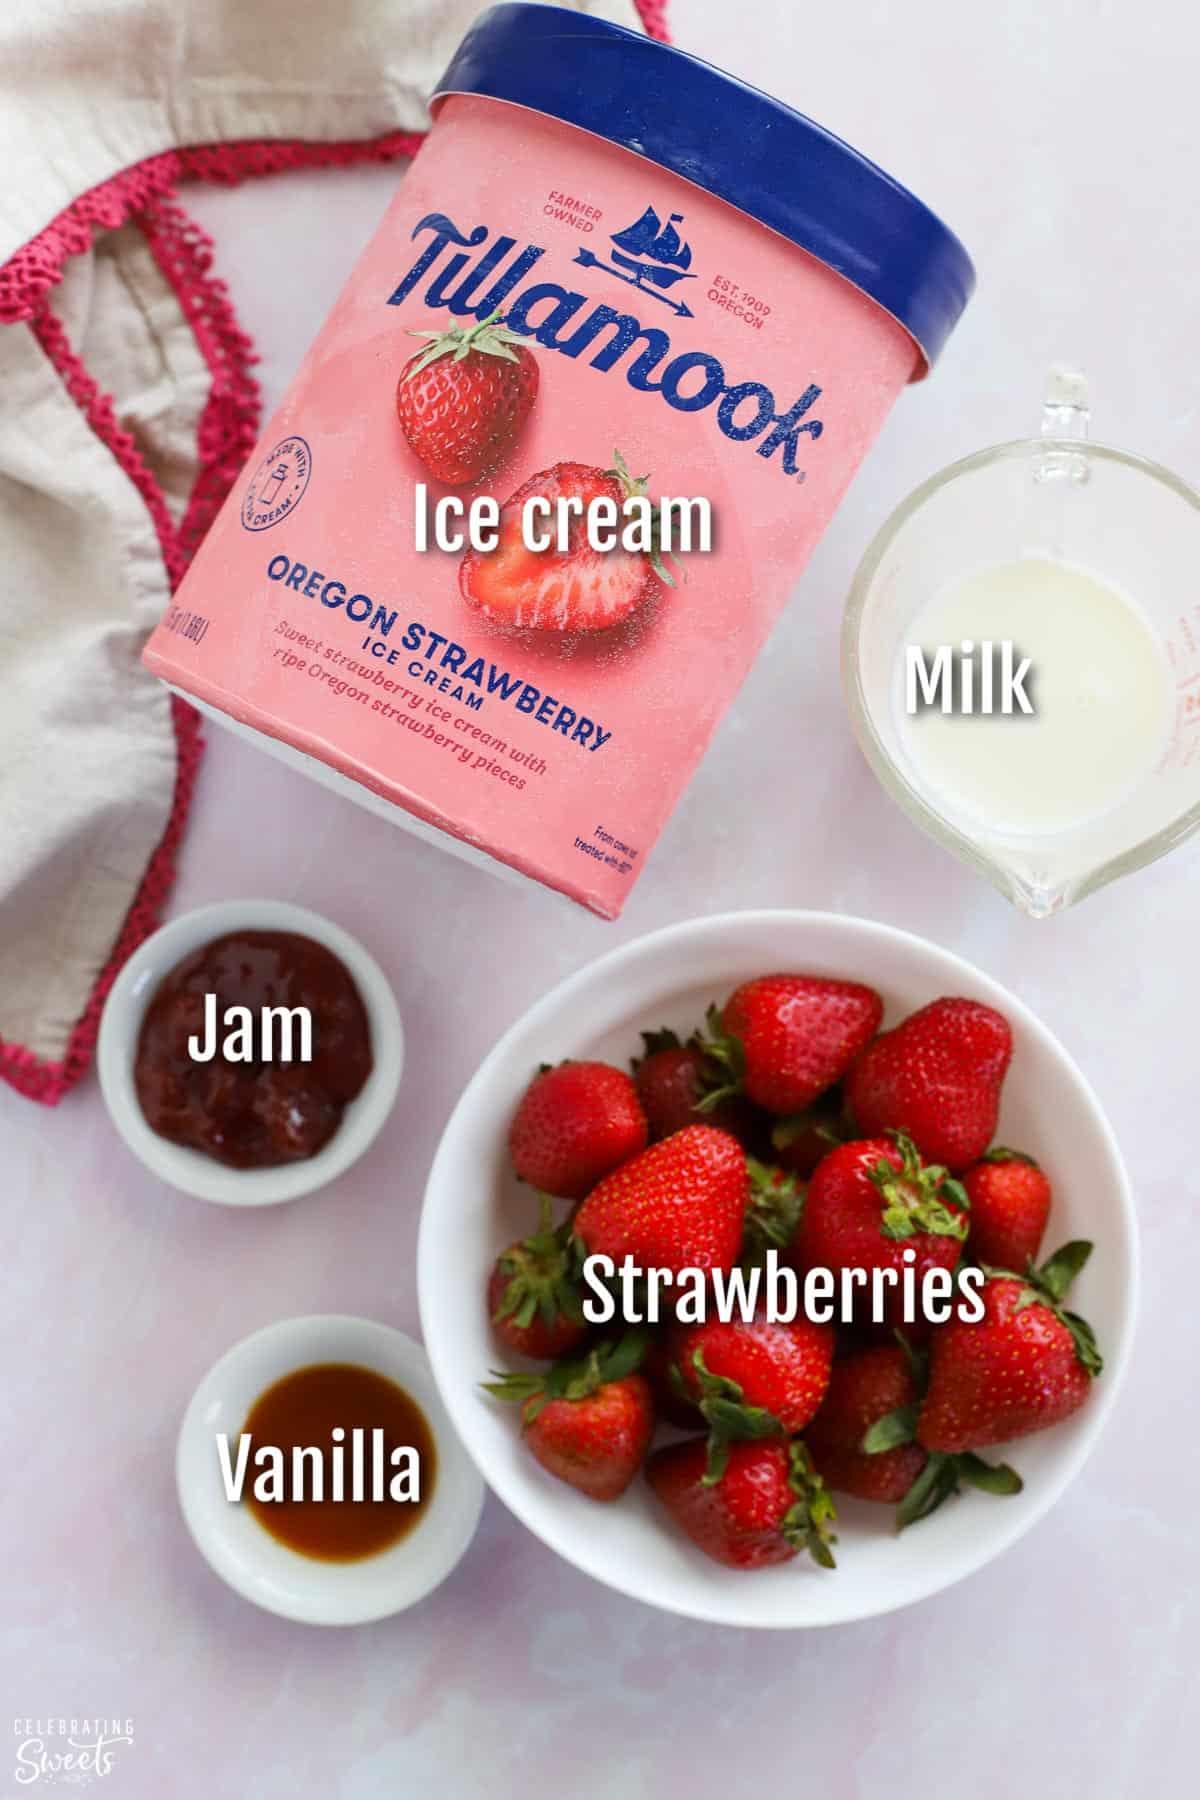 Ingredients for strawberry milkshake: ice cream, milk, strawberries, vanilla, jam.